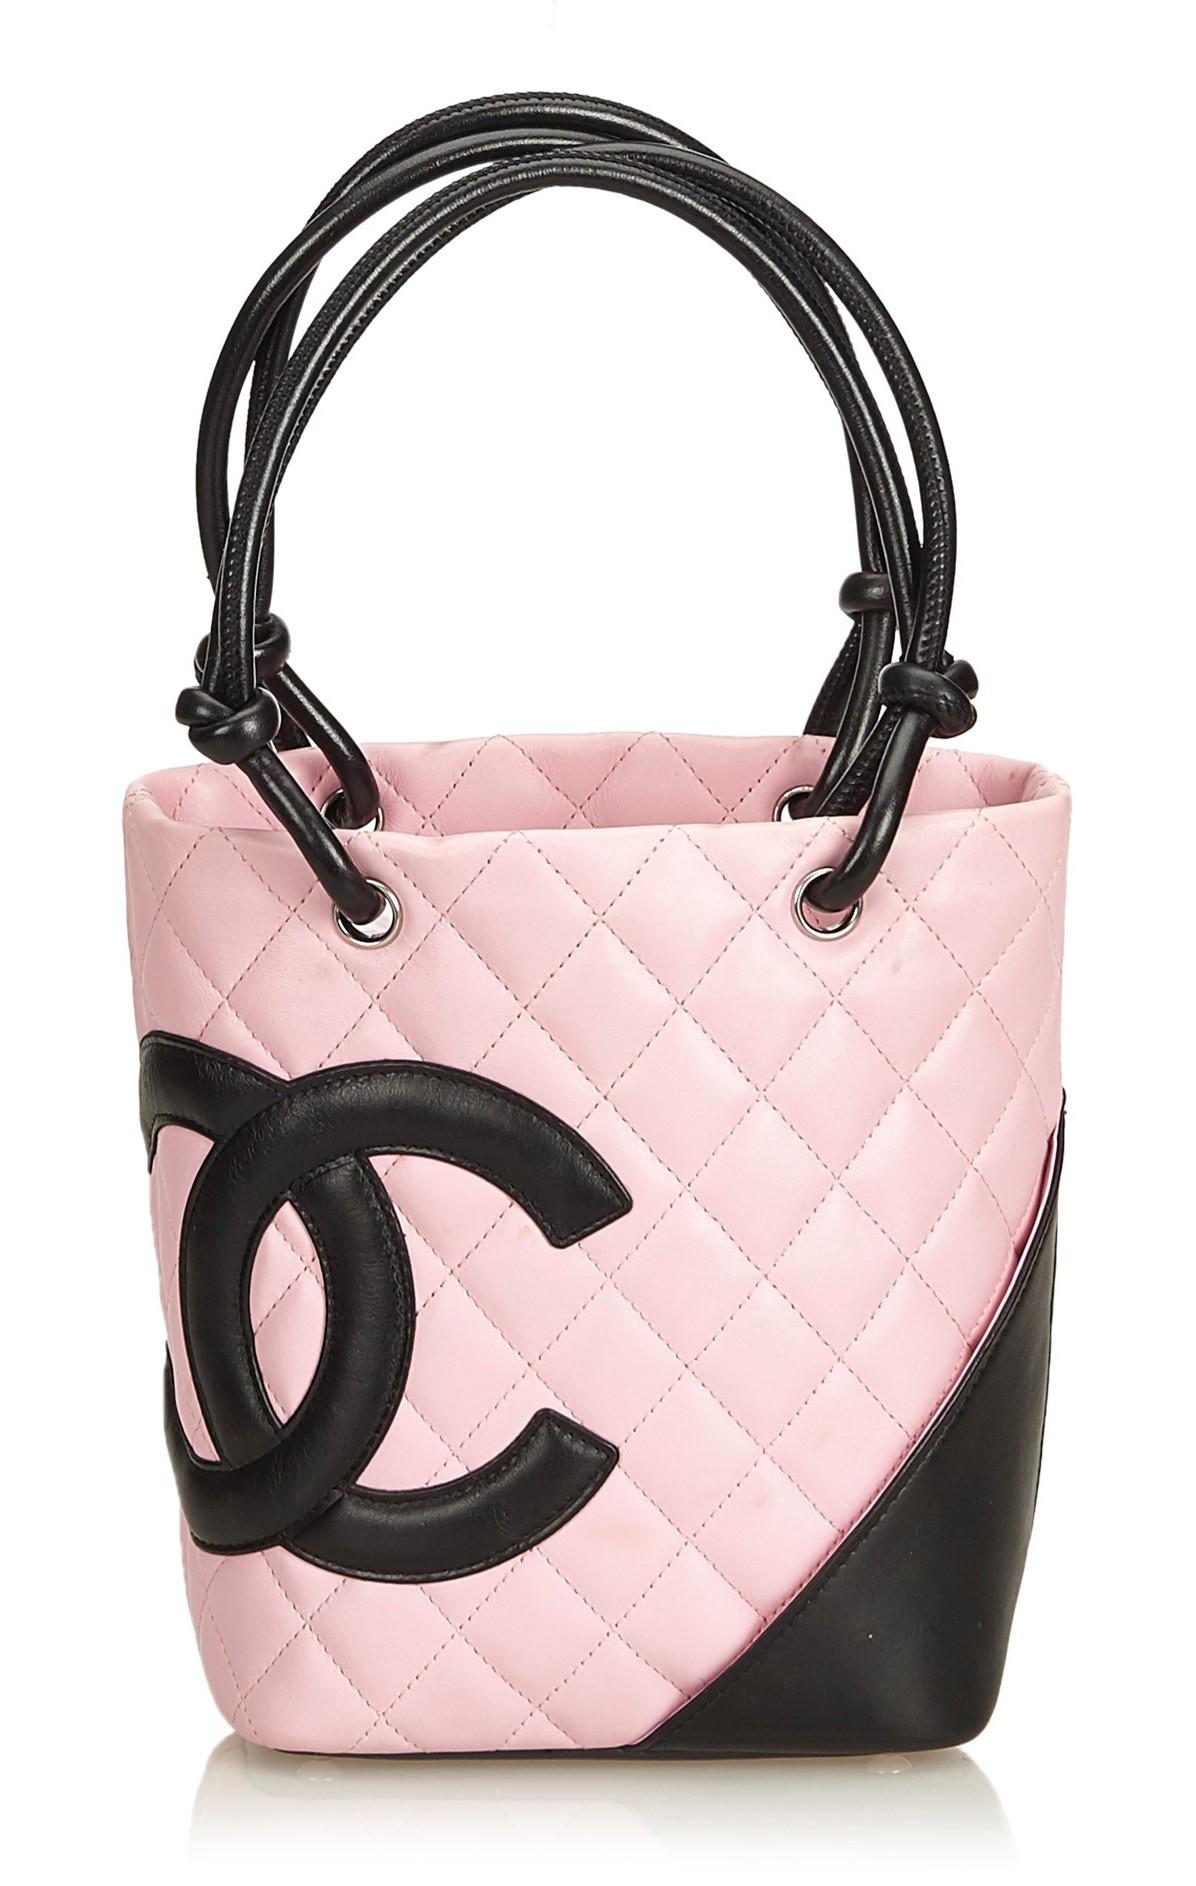 2ea8df3733a437 Chanel Vintage - Cambon Ligne Petit Bucket Bag - Pink Black - Leather  Handbag - Luxury High Quality - Avvenice